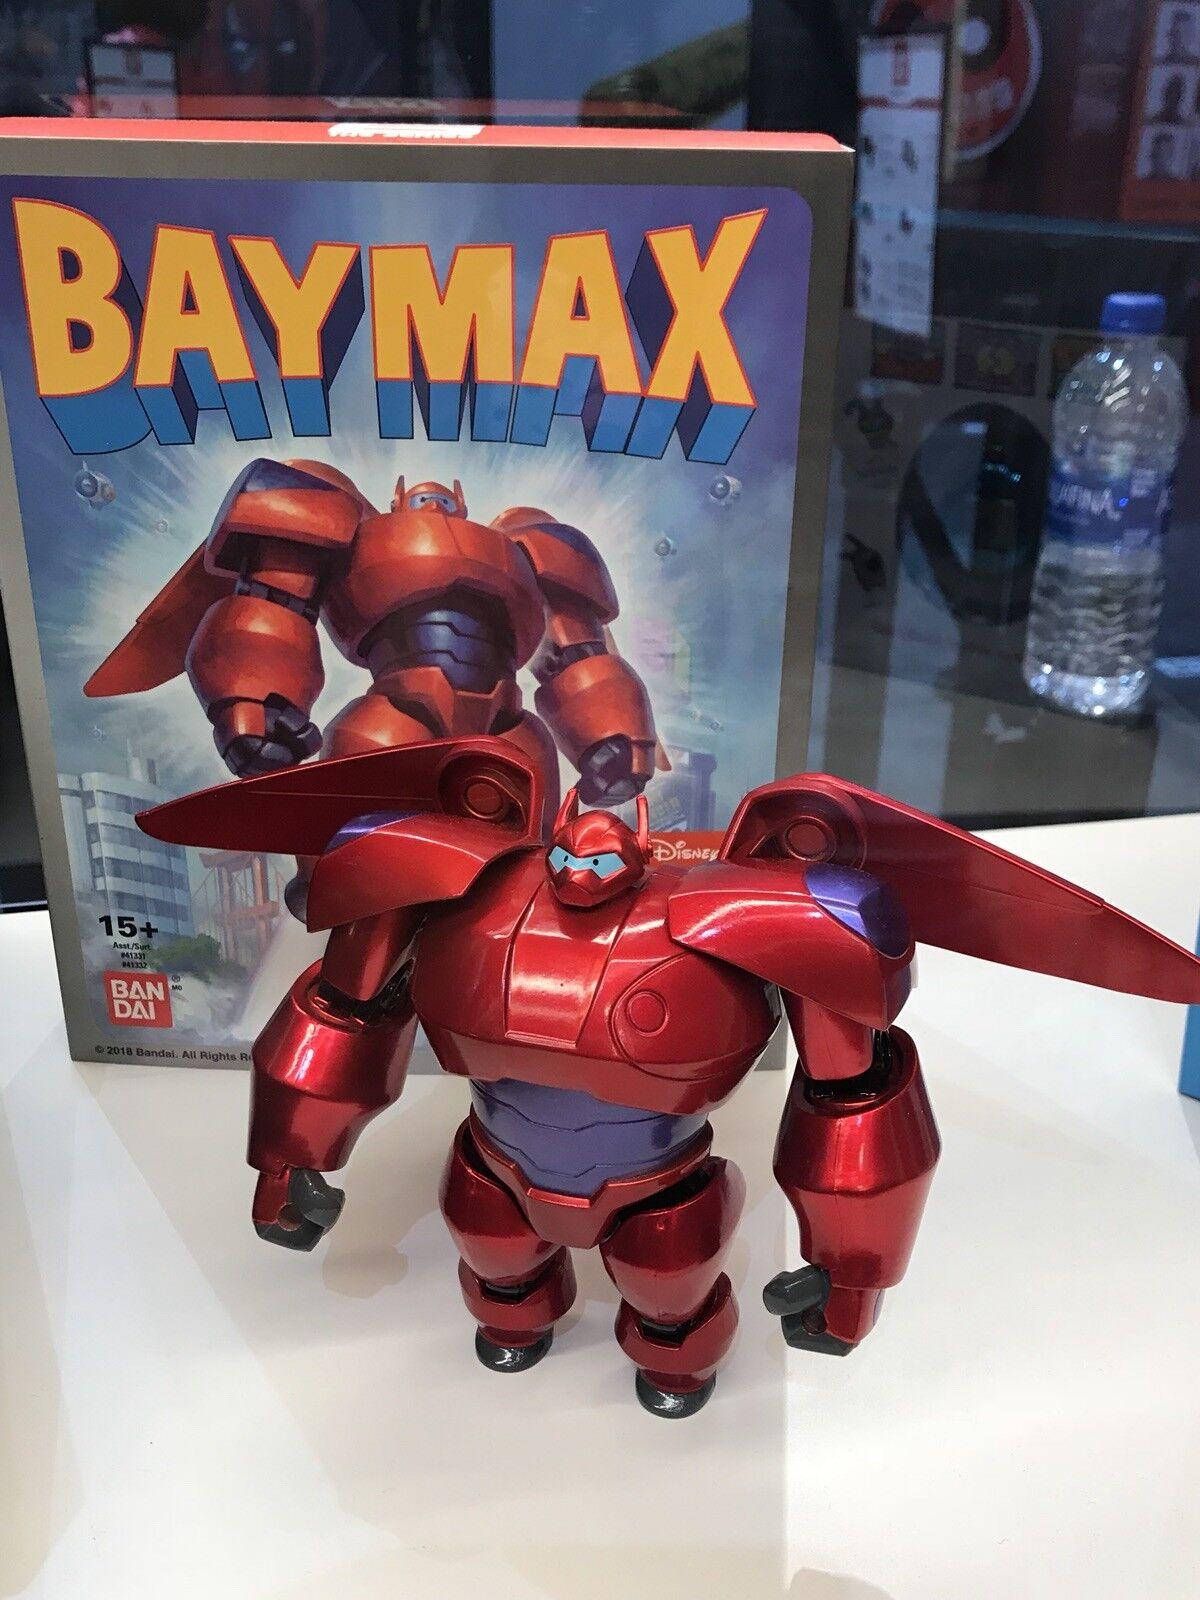 2018 SDCC Exclusive Die-Cast Armorosso Baymax cifra  gree Hero 6 Beai - Signed  garanzia di qualità